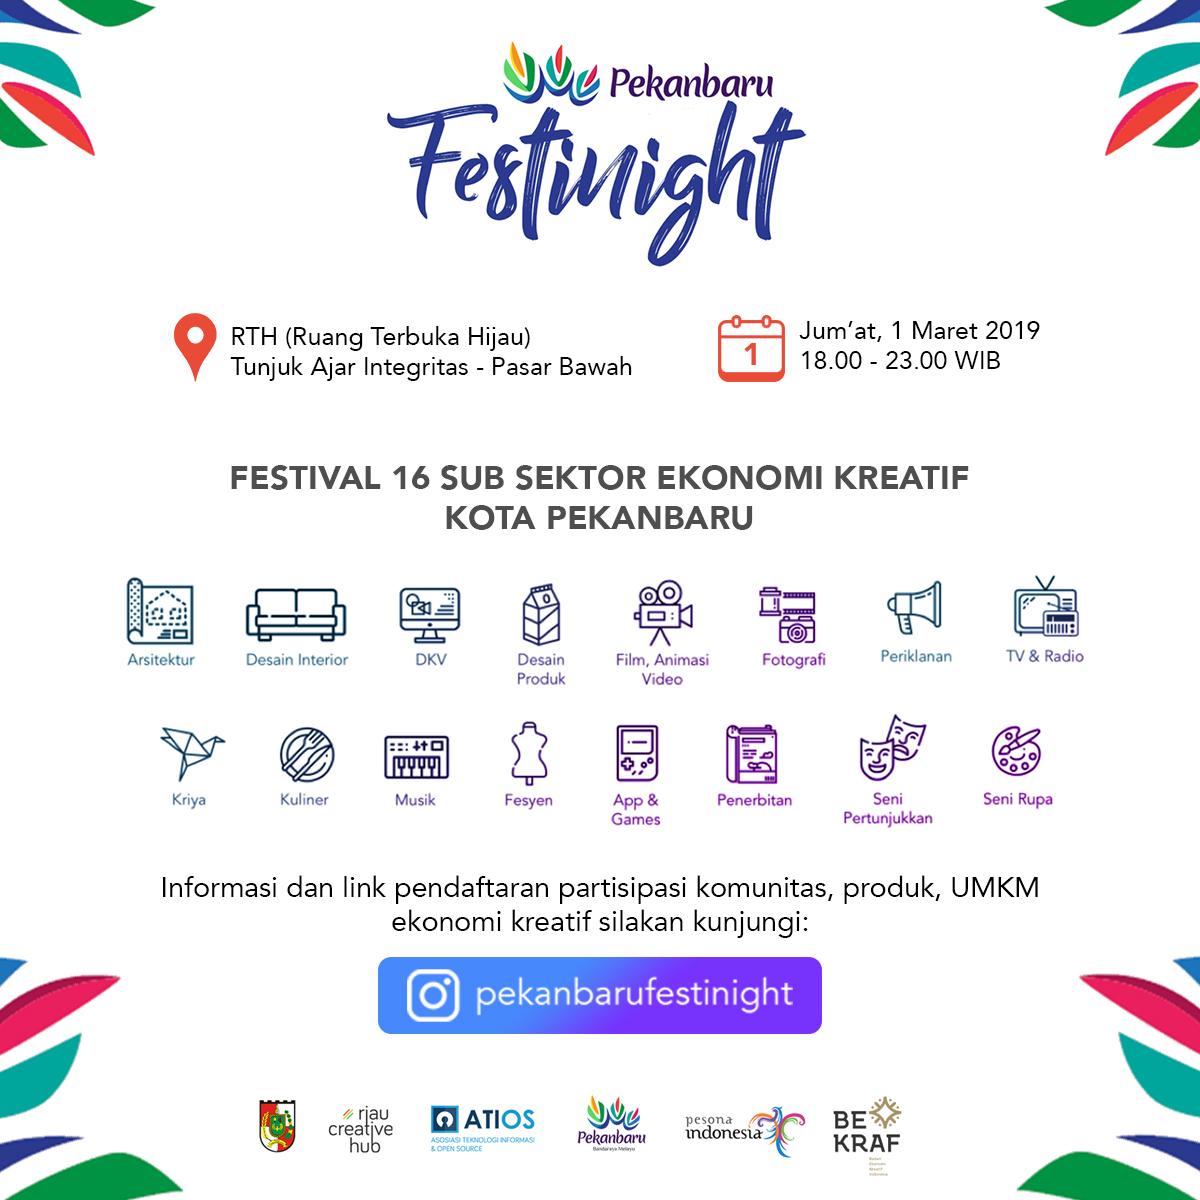 Pembukaan Pendaftaran Partisipasi Ekonomi Kreatif Pekanbaru Festinight